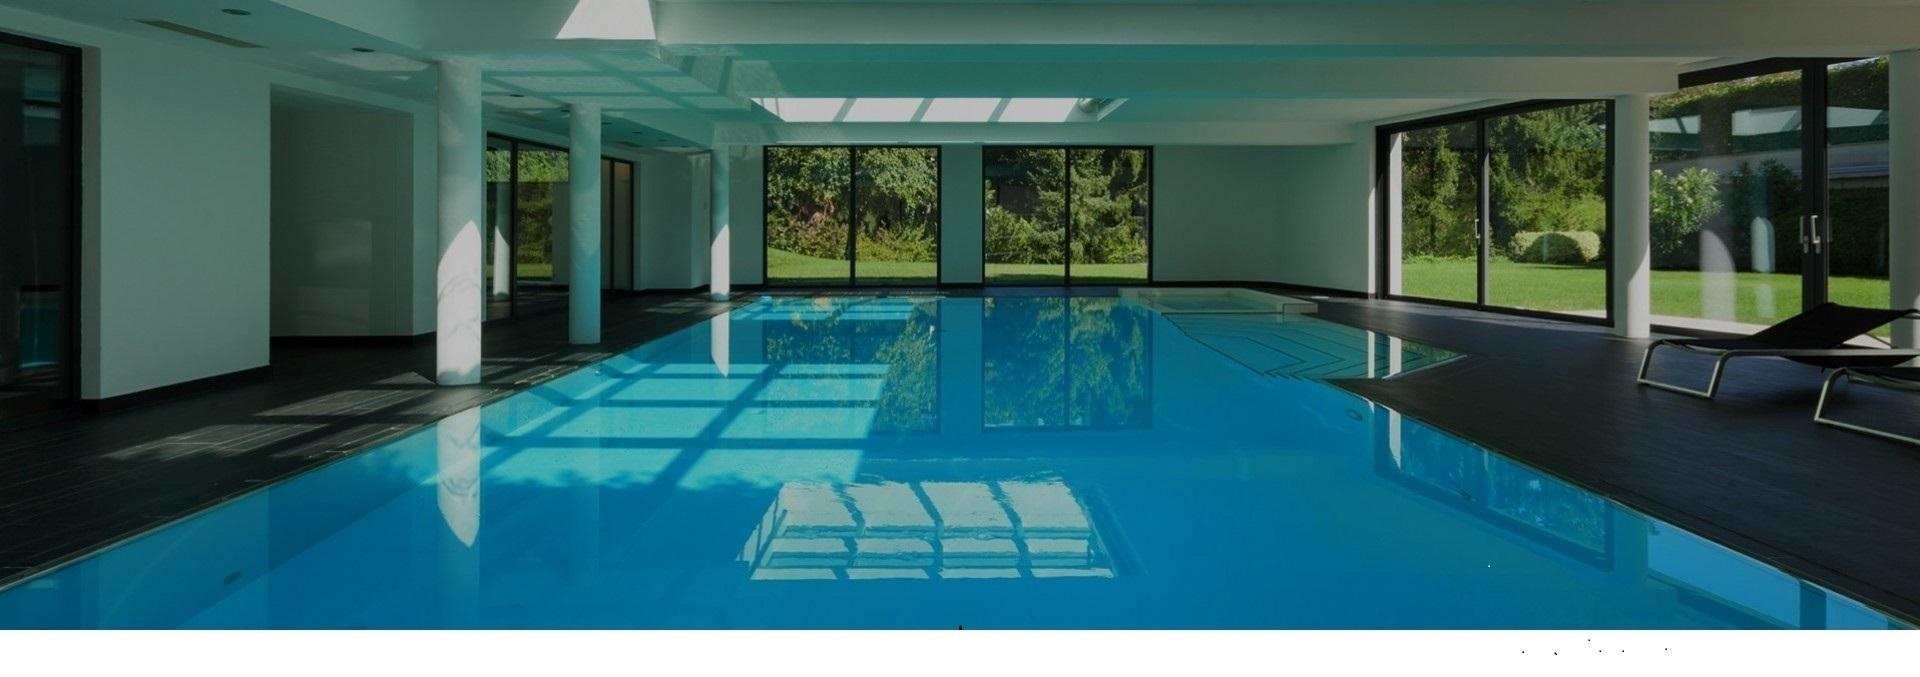 Contracorriente piscina